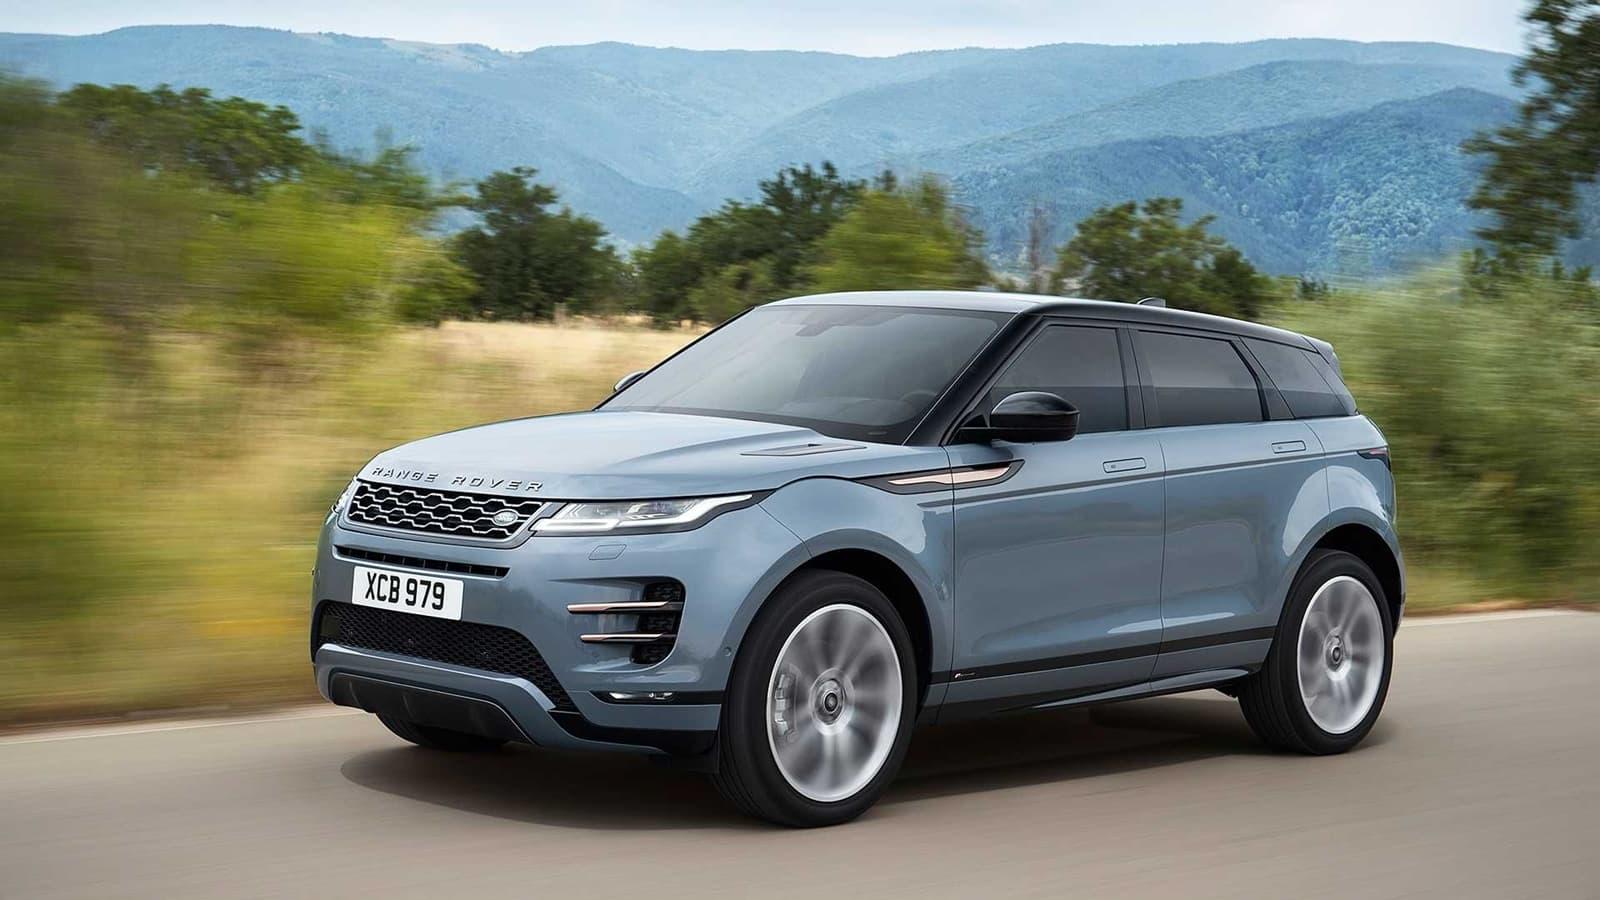 Range Rover Evoque 2019 1118 019